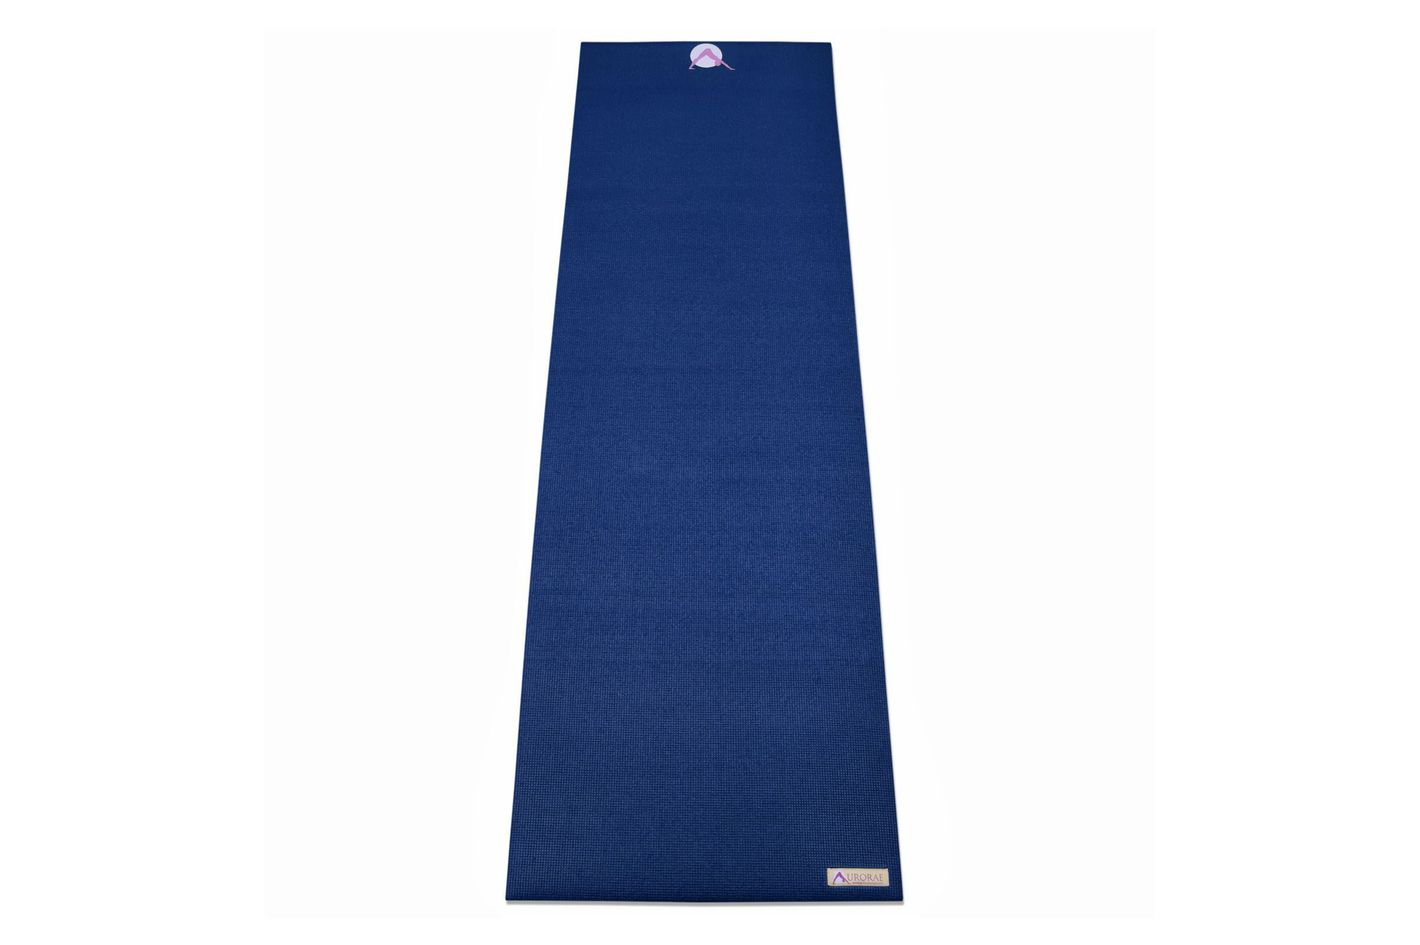 "Aurorae Classic Extra Thick 1/4"" and Long 72"" Premium Eco Safe Yoga Mat"